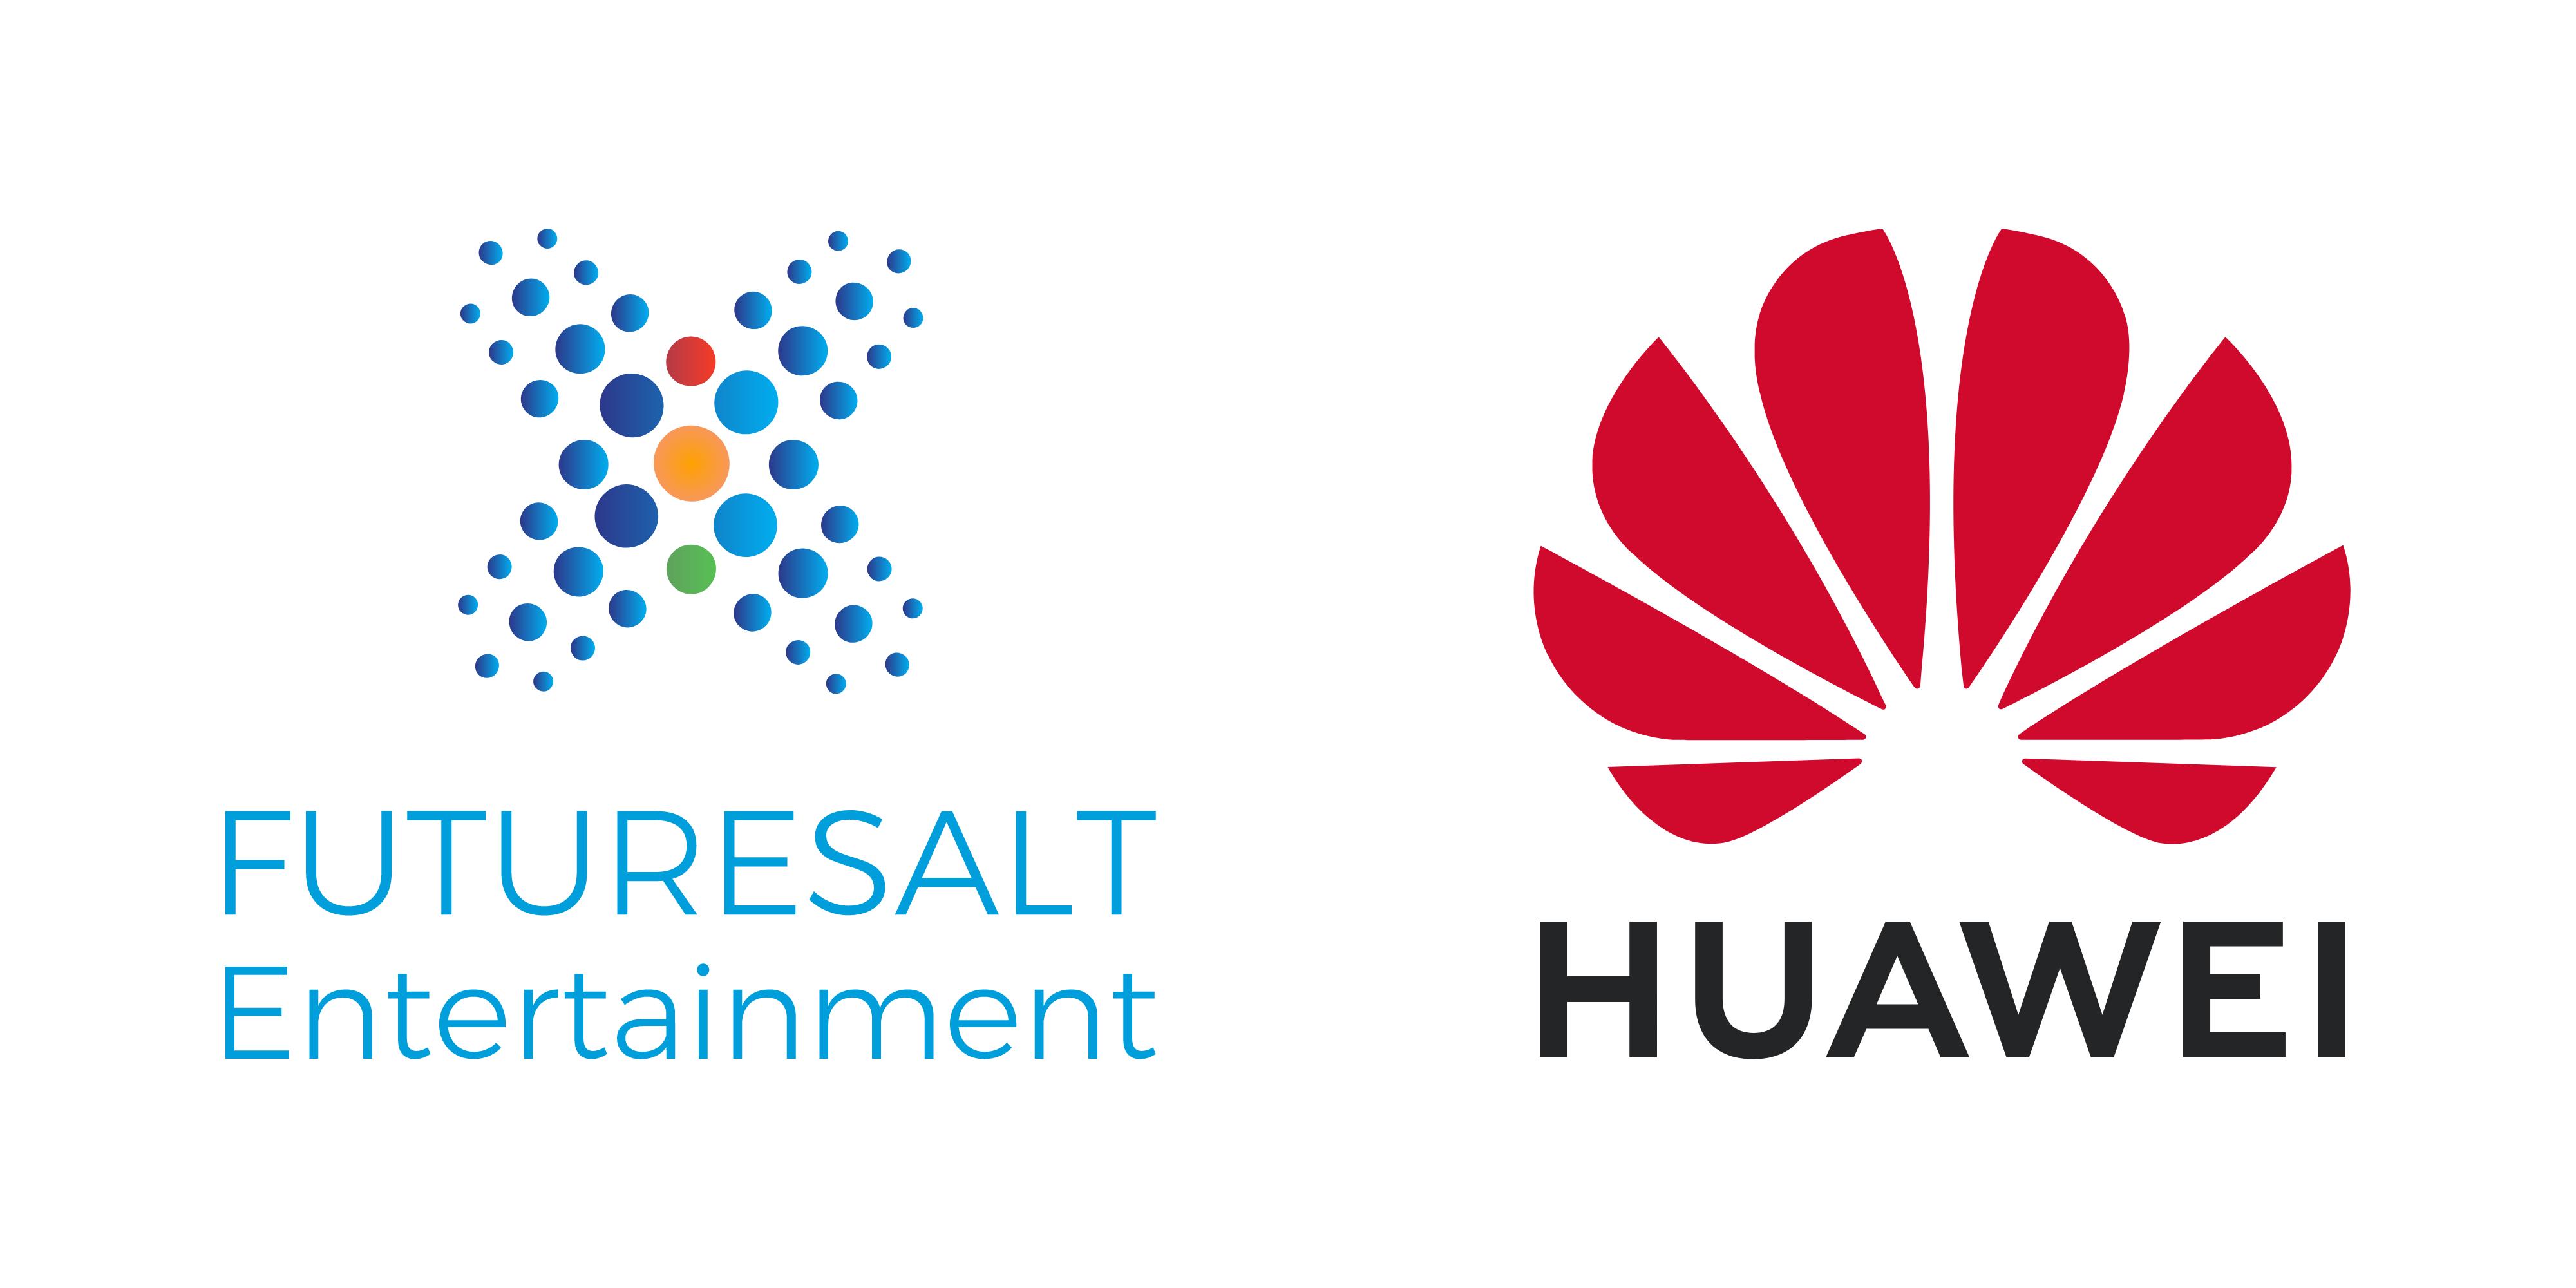 Futuresalt Entertainment partnerem Huawei